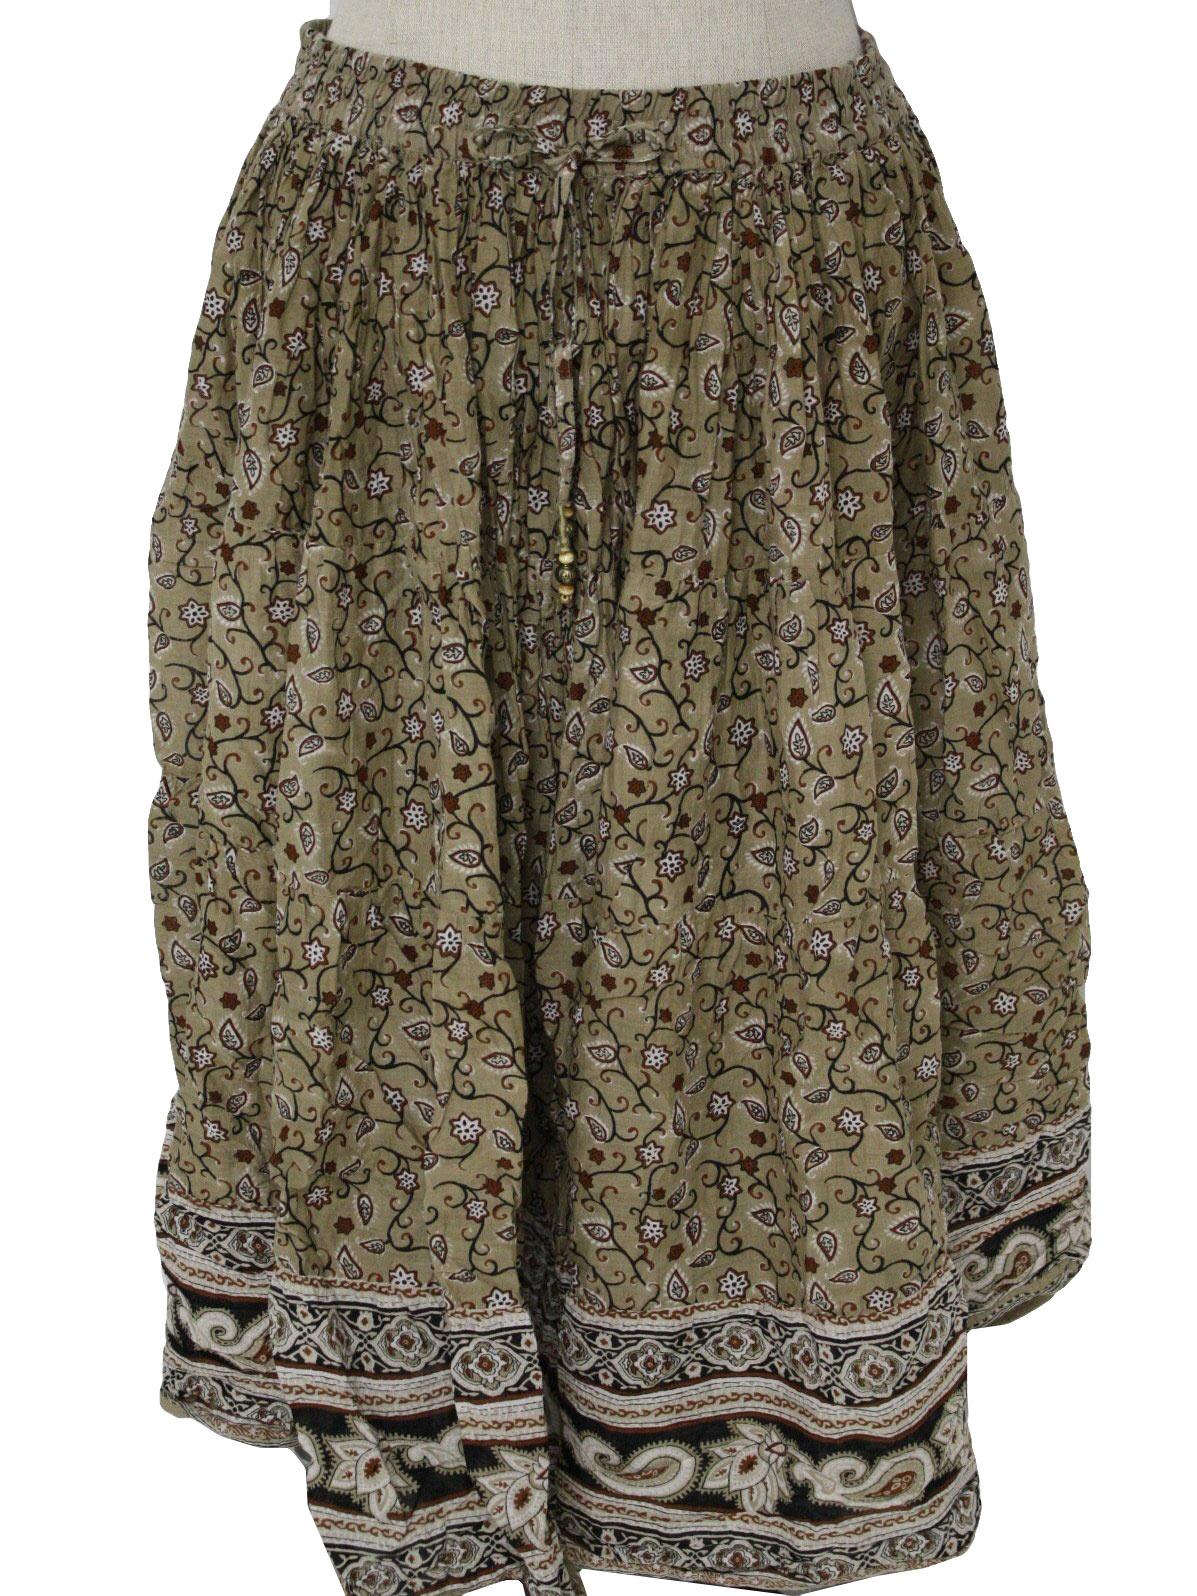 Shop Women Clothing Skirts Boden Tan Knee Length